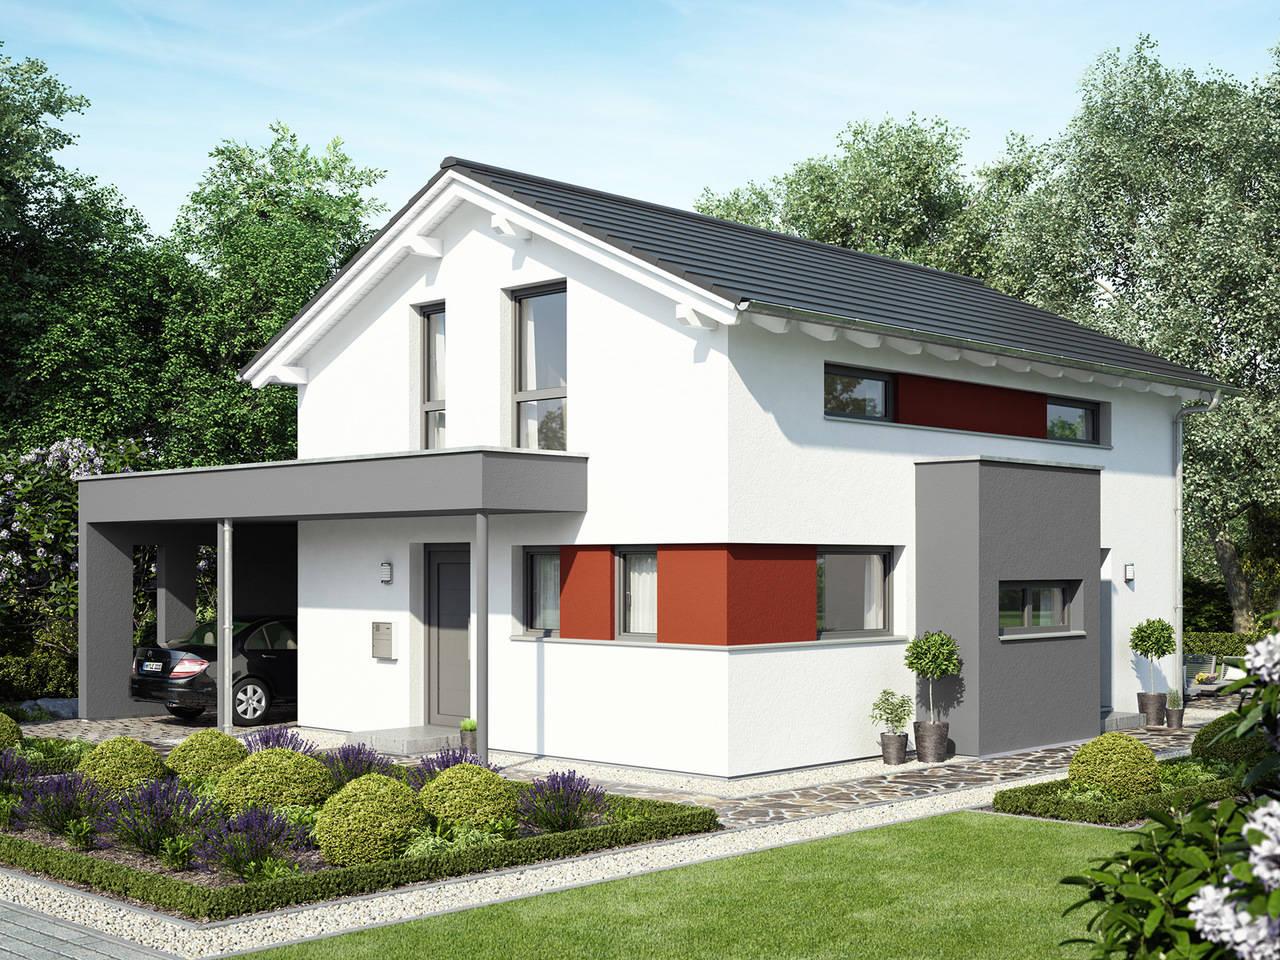 Edition 2 V2 - Einfamilienhaus